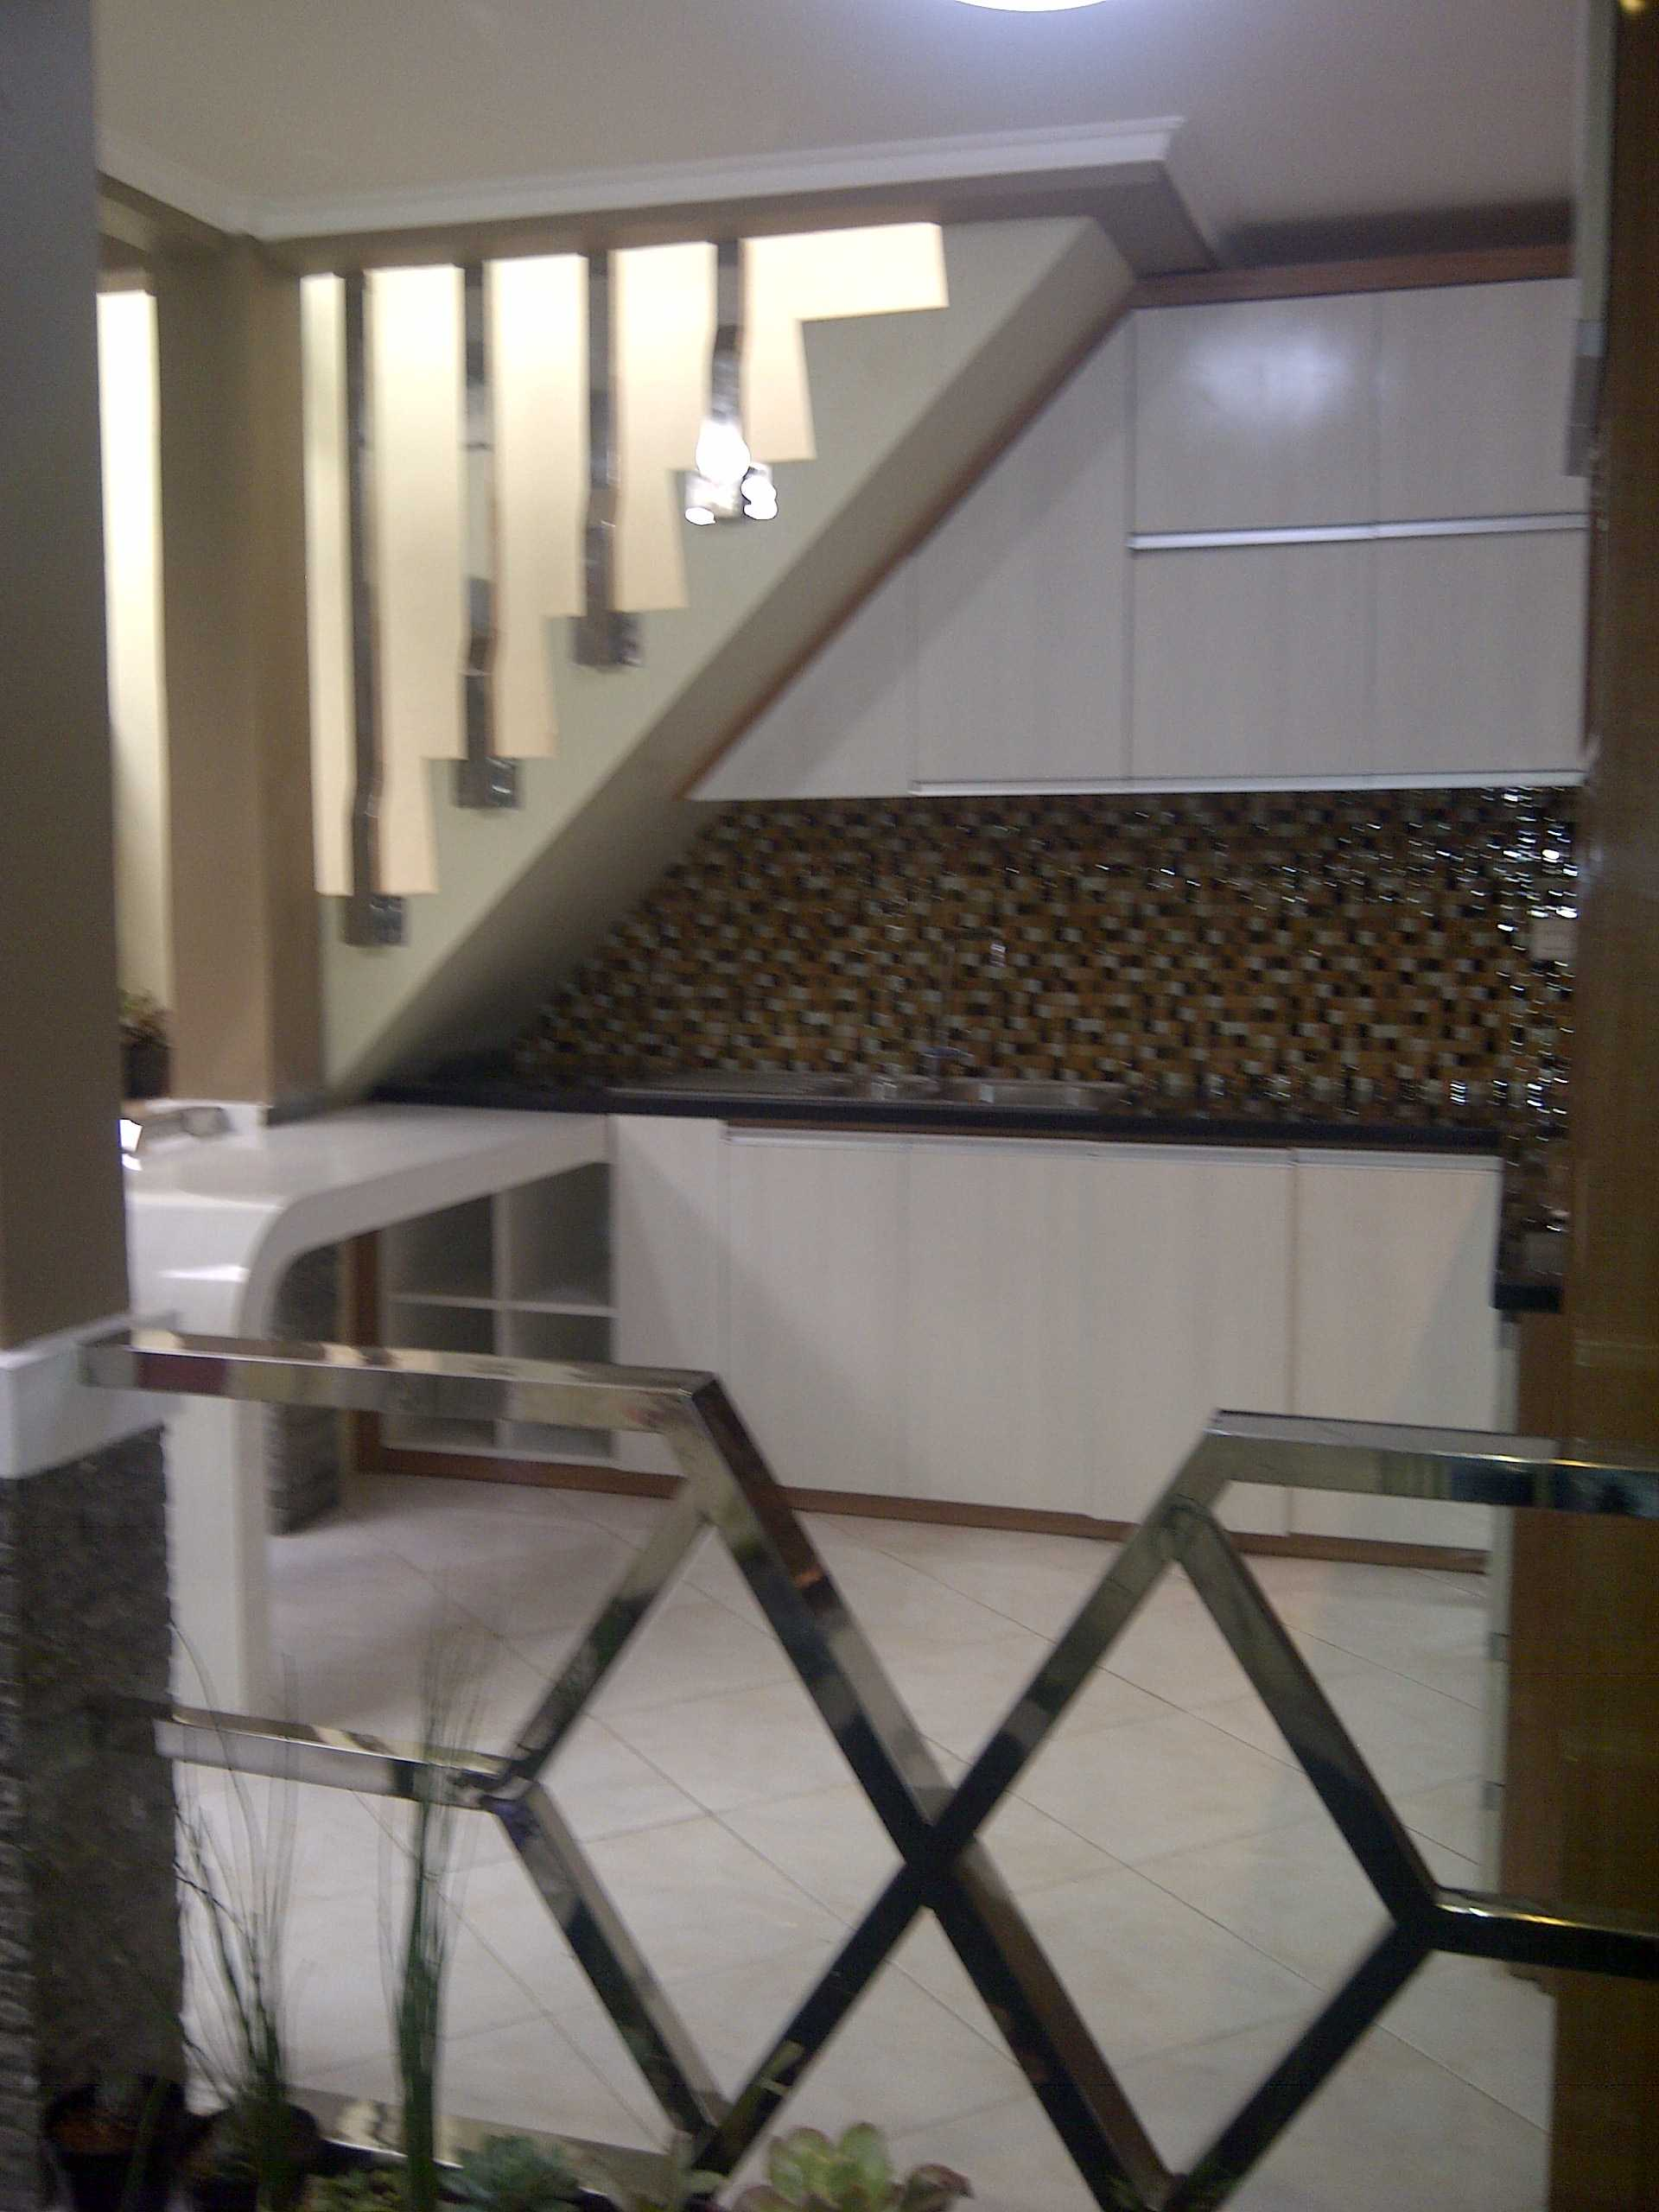 4 Sisi Indonesia Kitchen Set Bandung City, West Java, Indonesia  Img-20130513-00577   34547